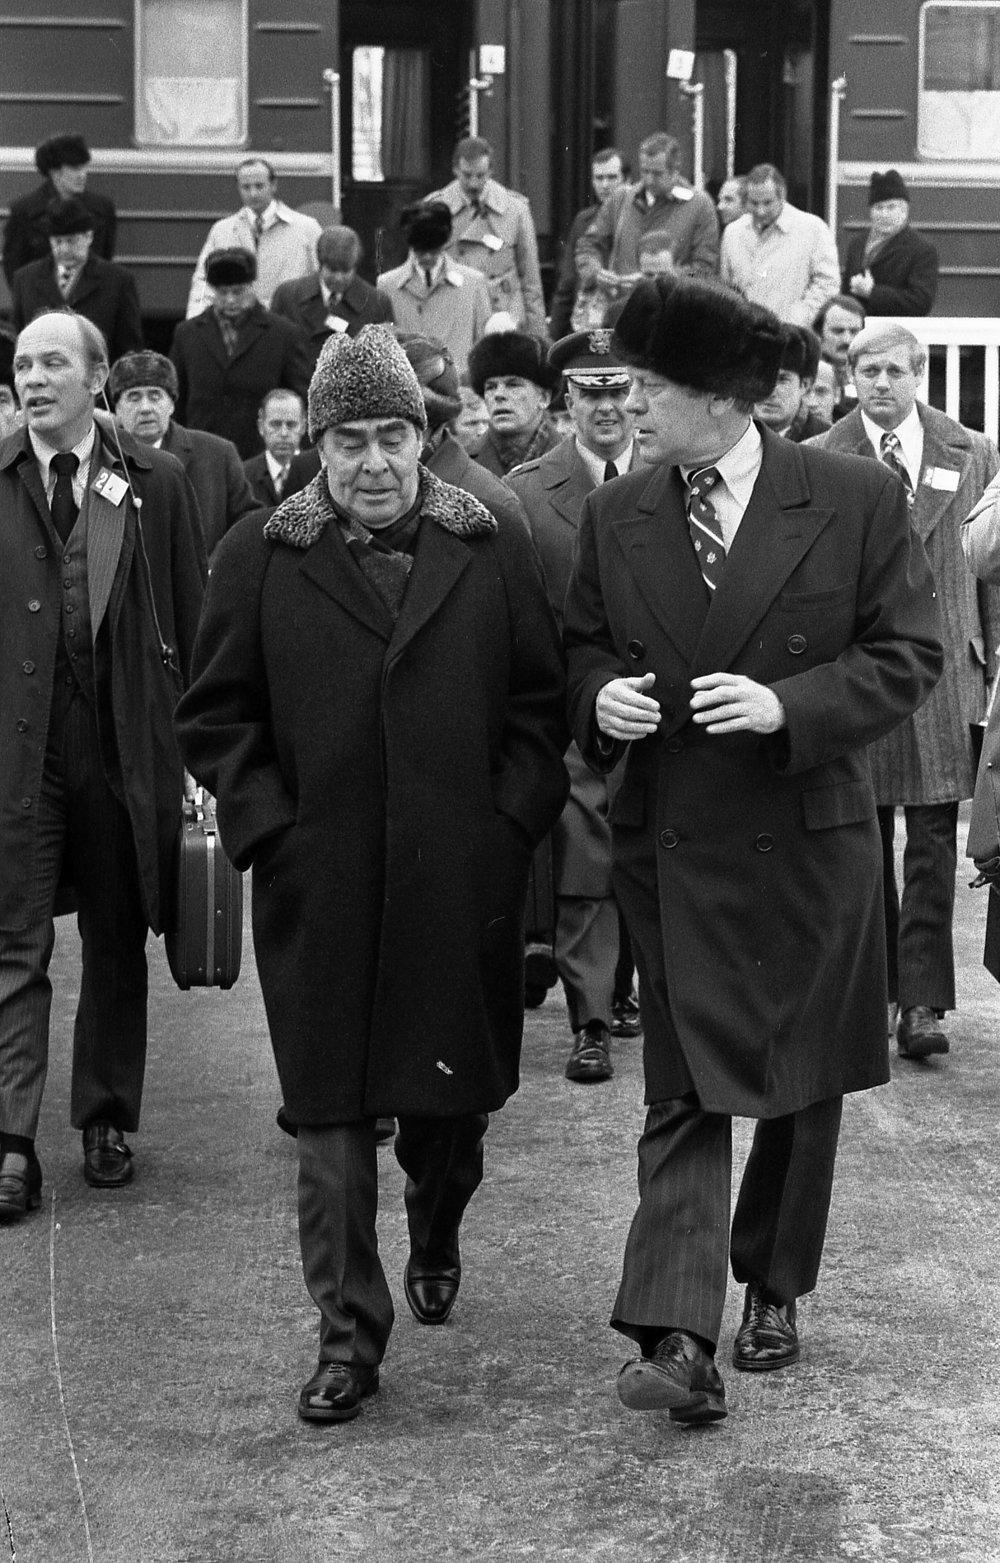 Brezhnev greets Gerald Ford upon his arrival at Vozdvizhenka for the Vladivostok Summit on 23 November 1974.